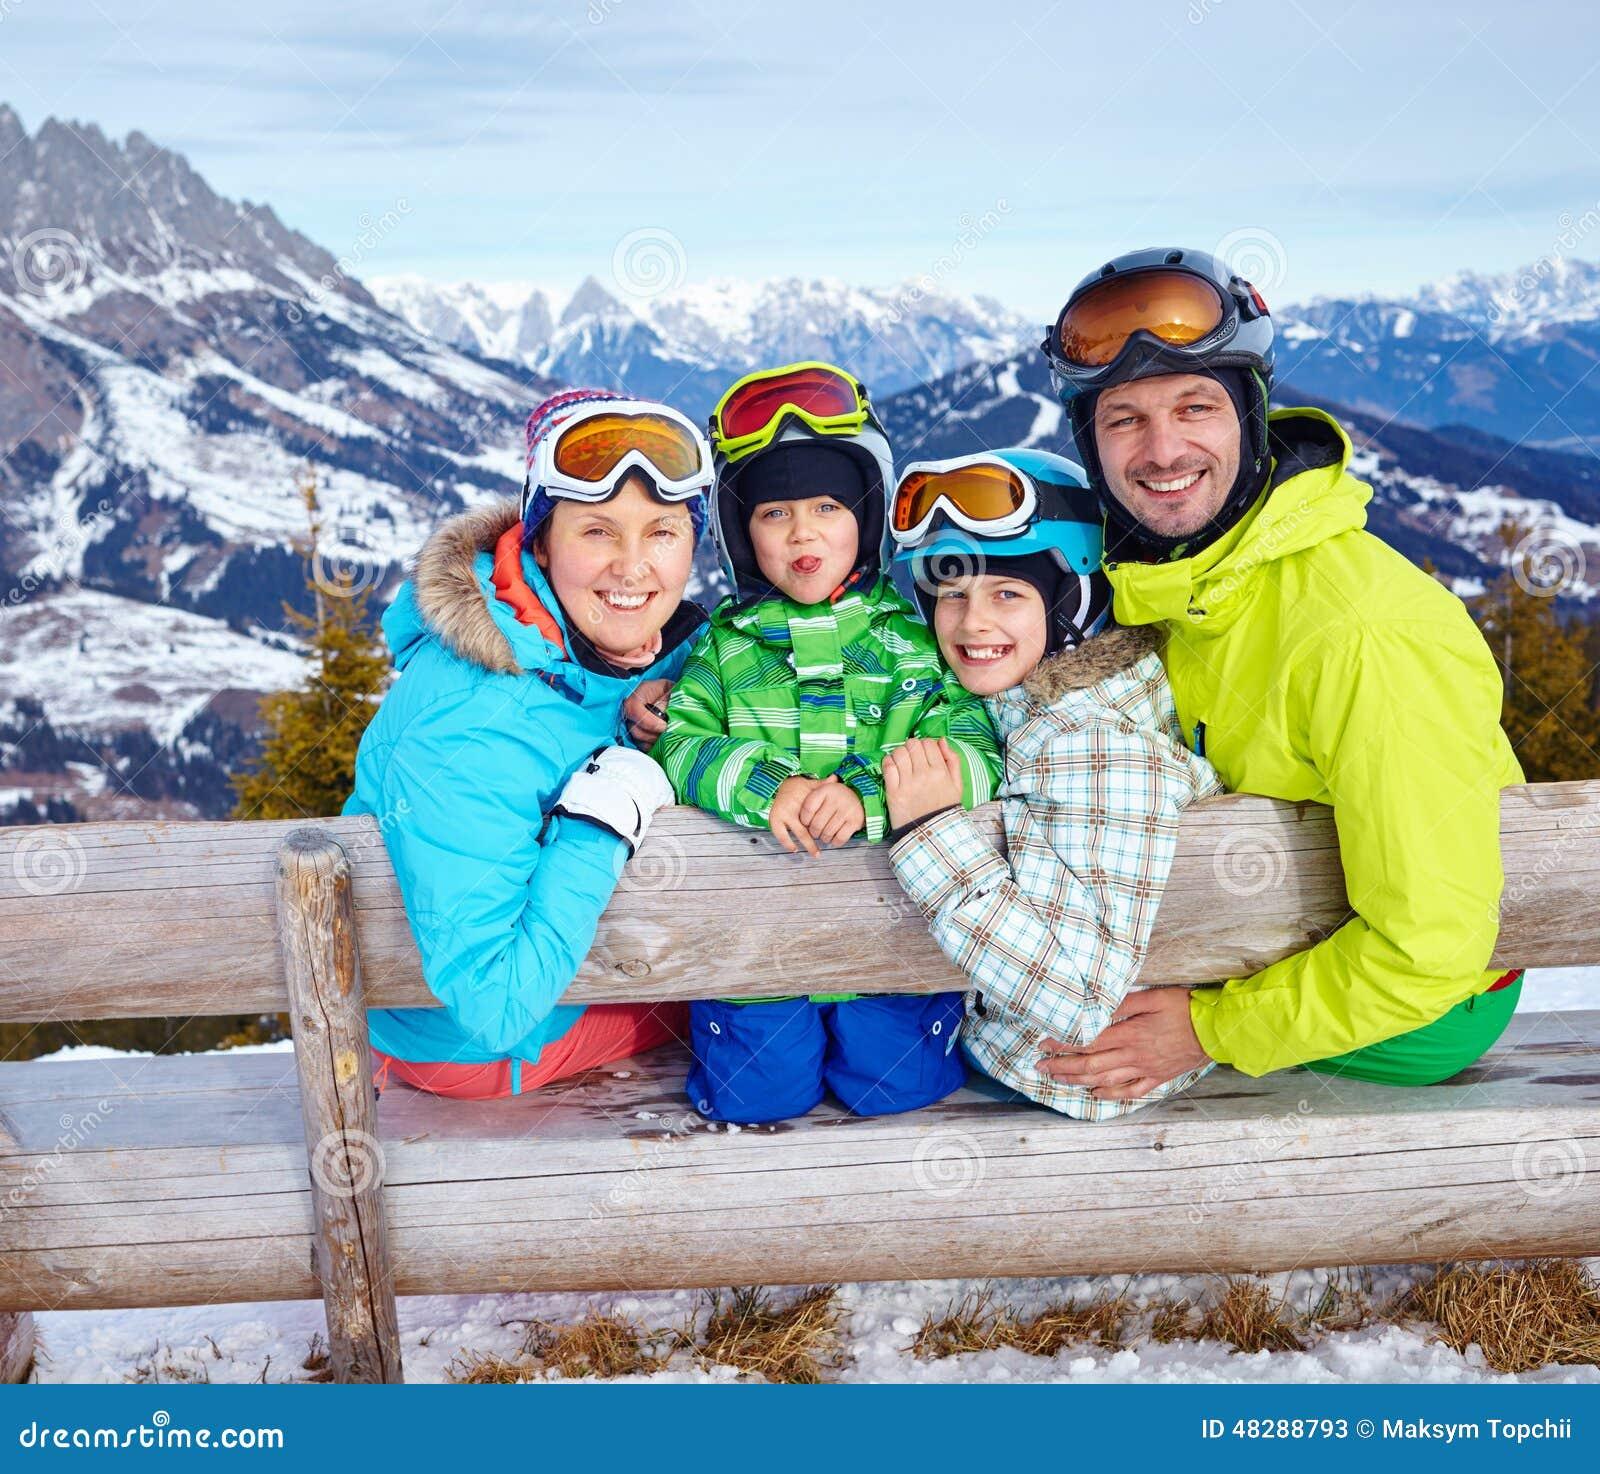 Family enjoying winter vacations stock image image for Best family winter vacations